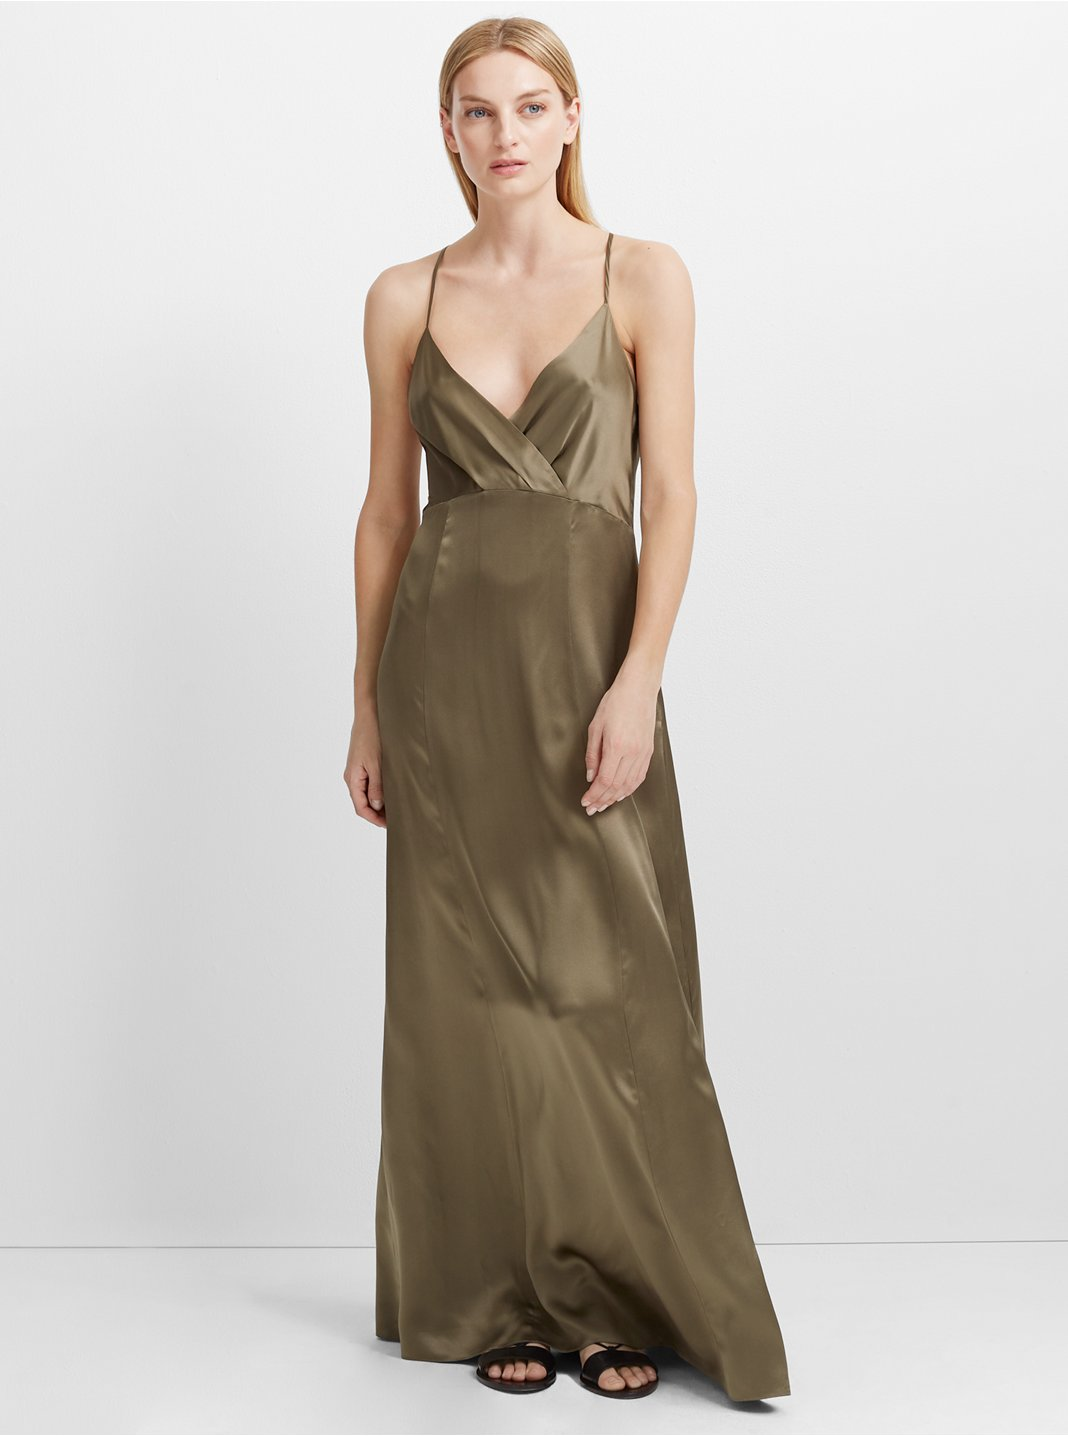 Zoyah Silk Dress